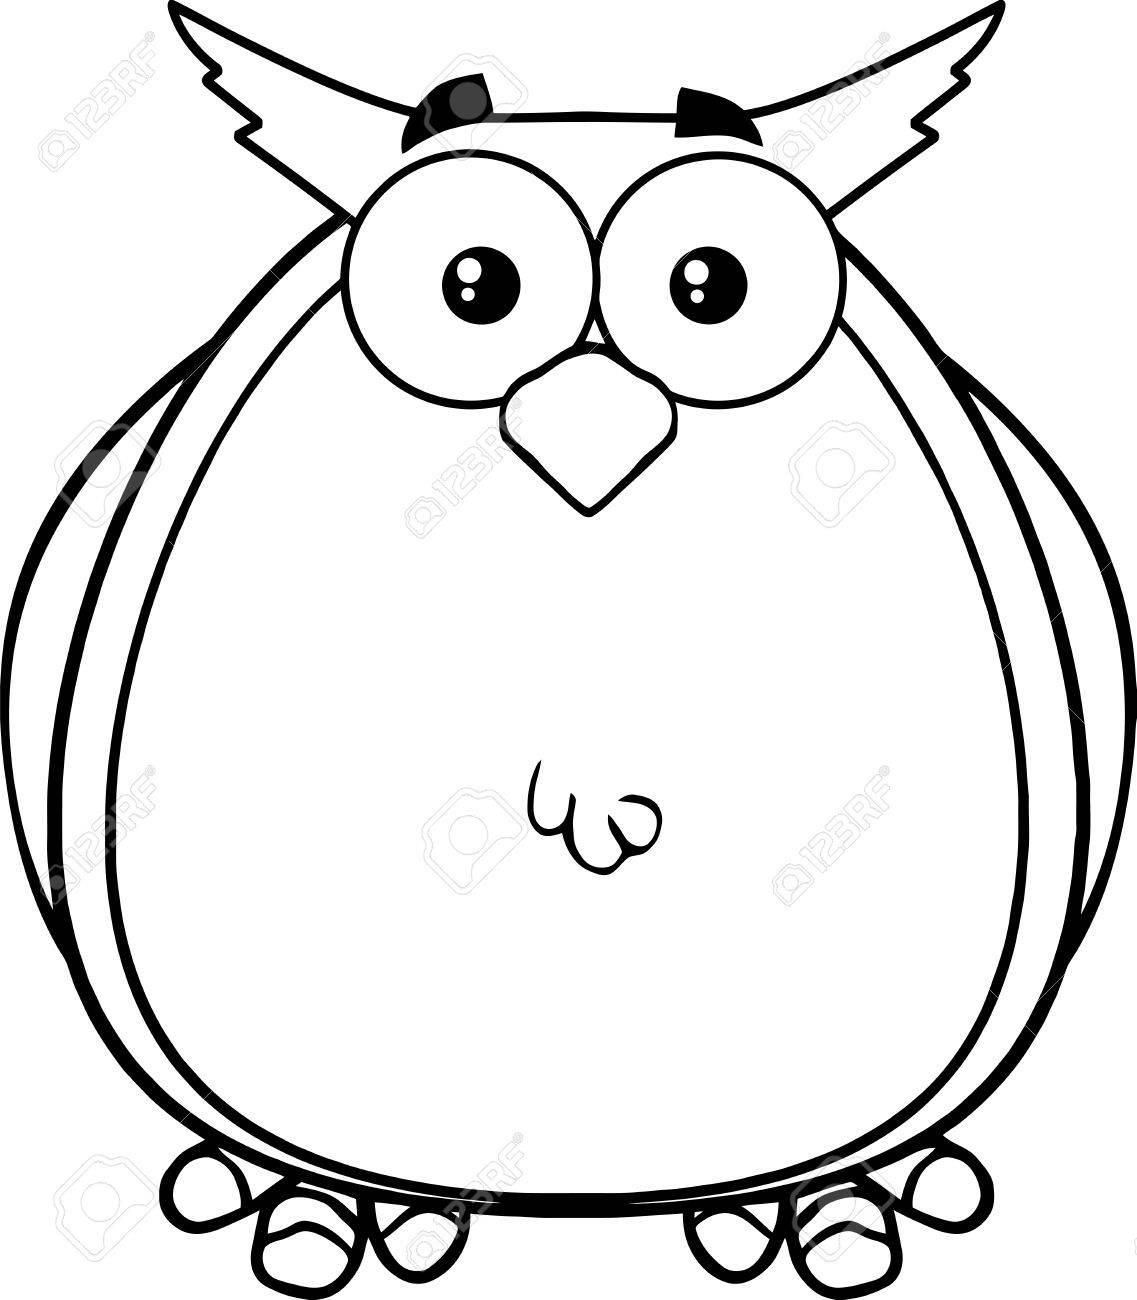 Black And White Owl Cartoon Mascot Karakter Illustratie Geïsoleerd